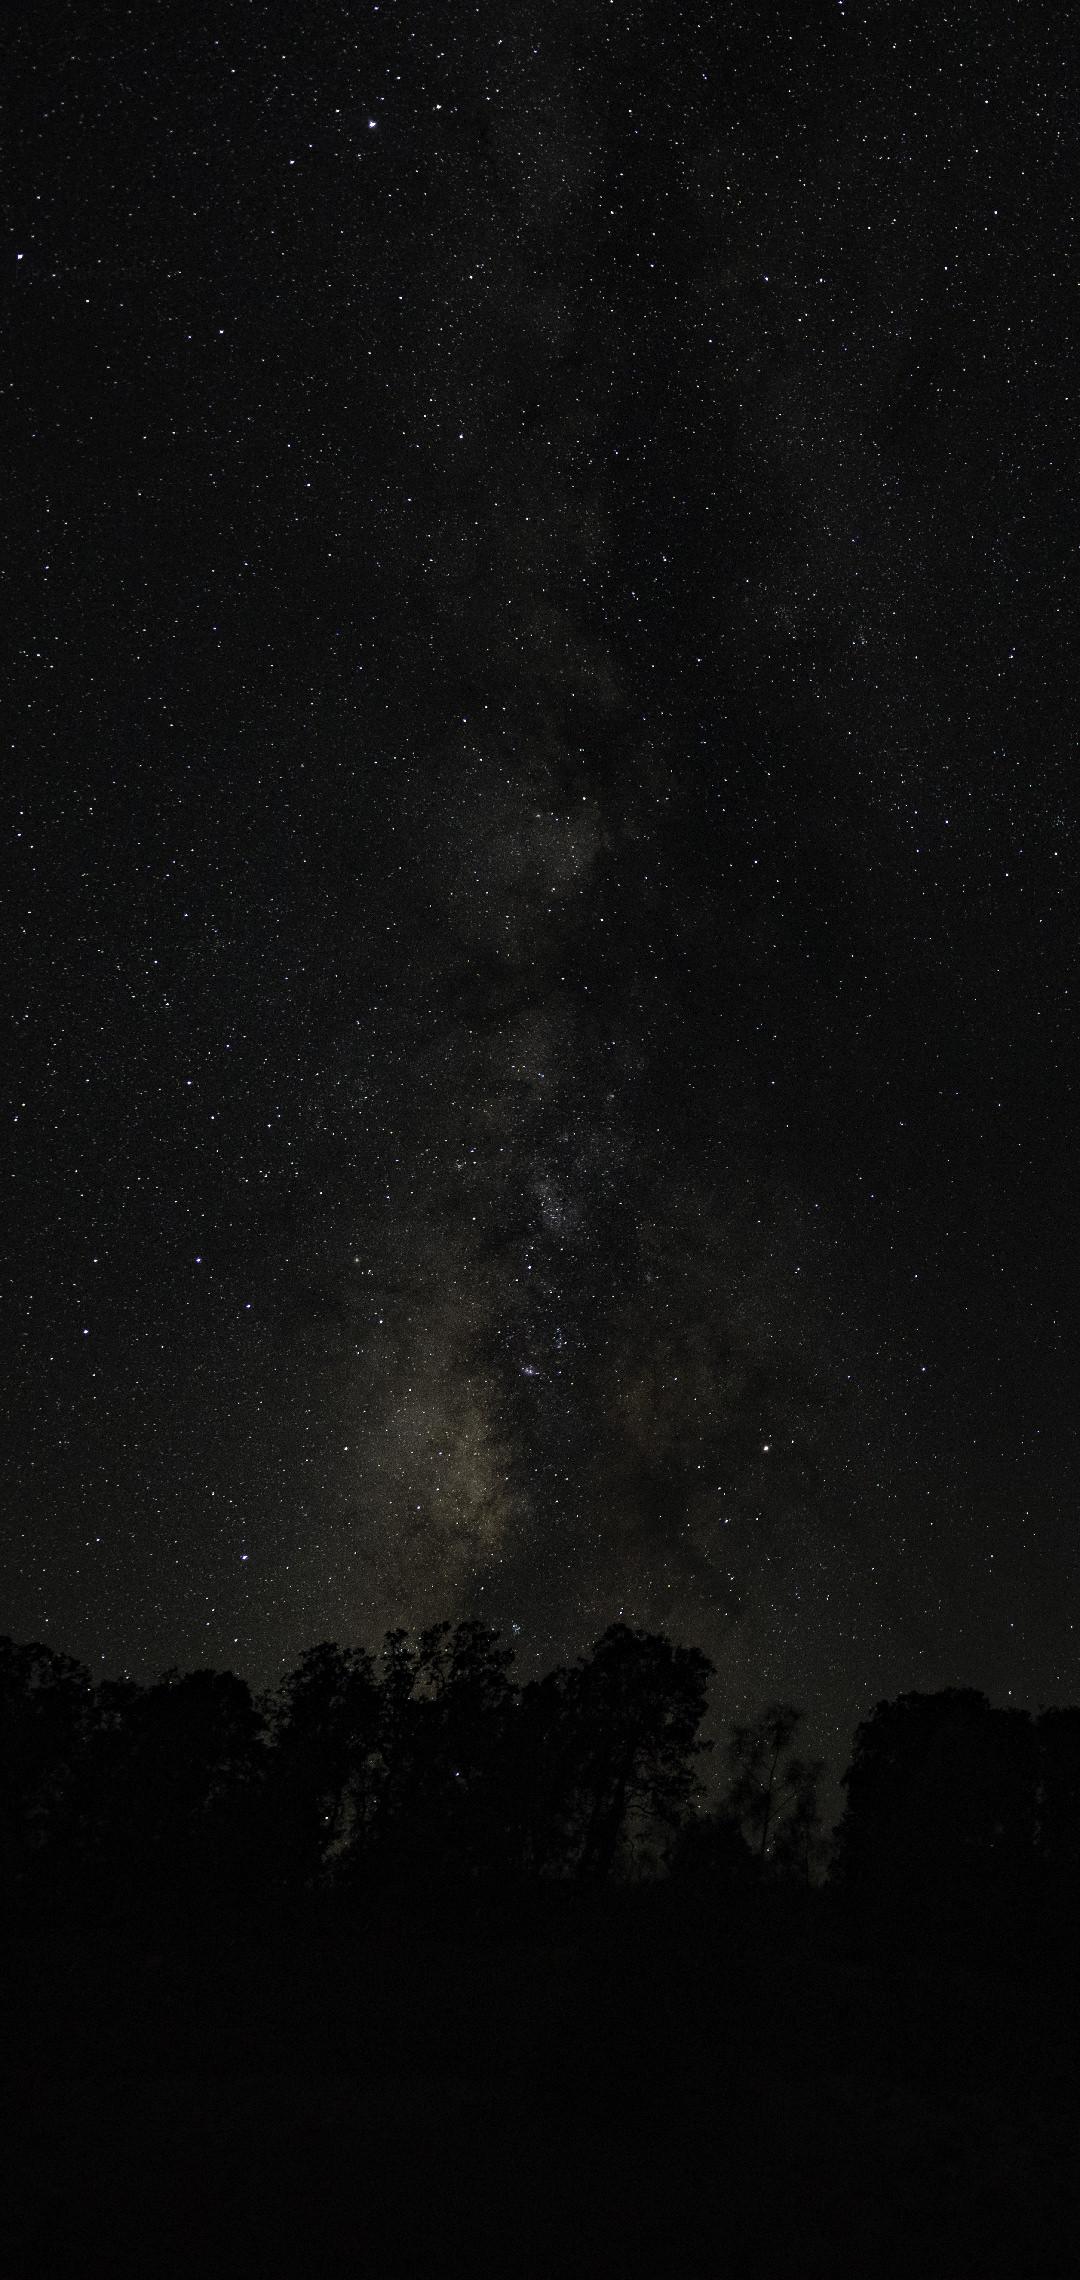 Milky Way Wallpaper for Oneplus 6   Album on Imgur 1080x2280